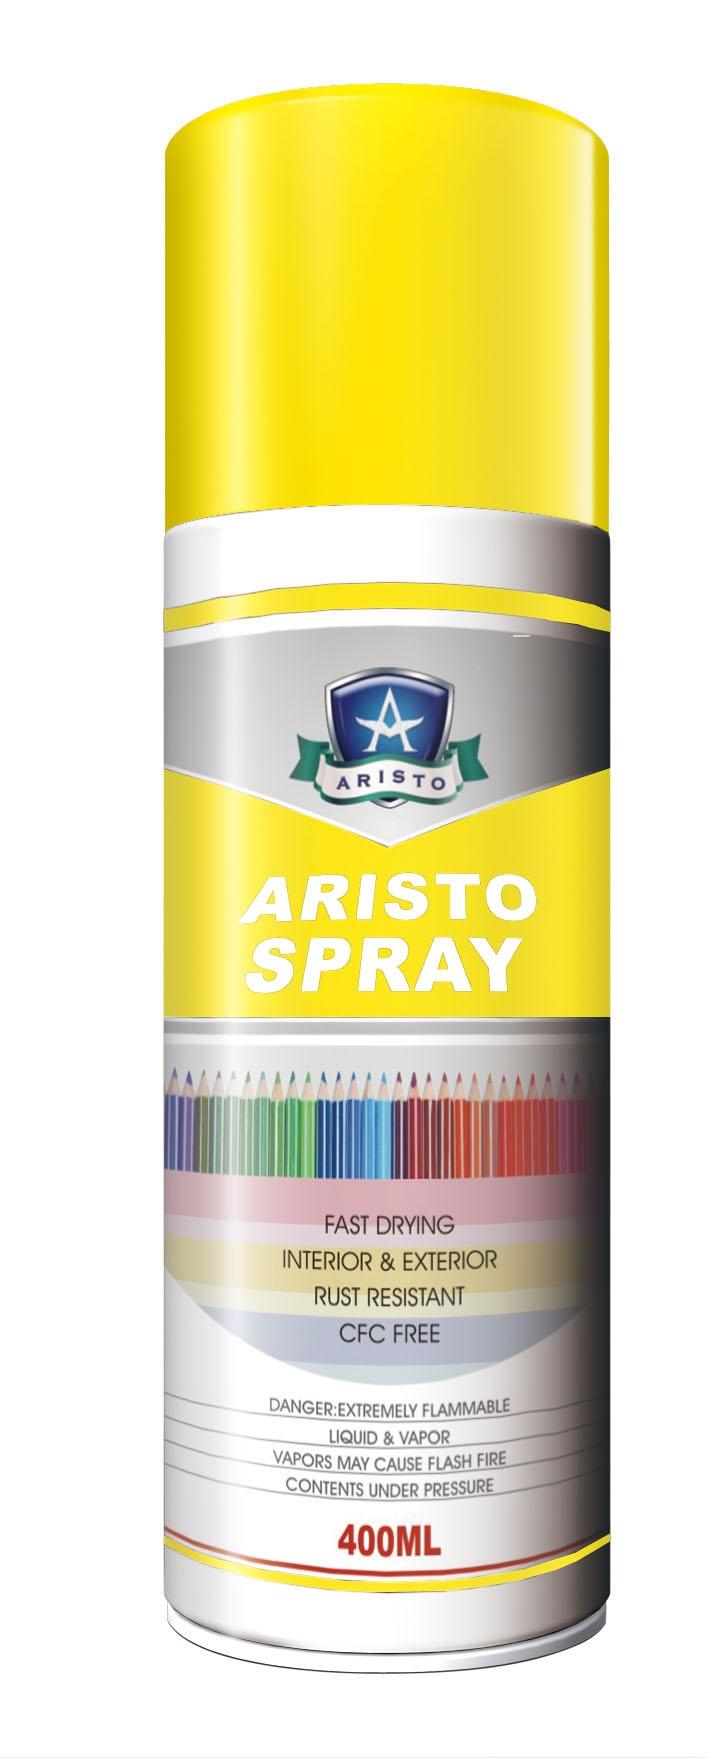 Fluorescent Spray Paint None Paint Glow Spray Paint Buy Fluorescent Paint Fluorescent Spray